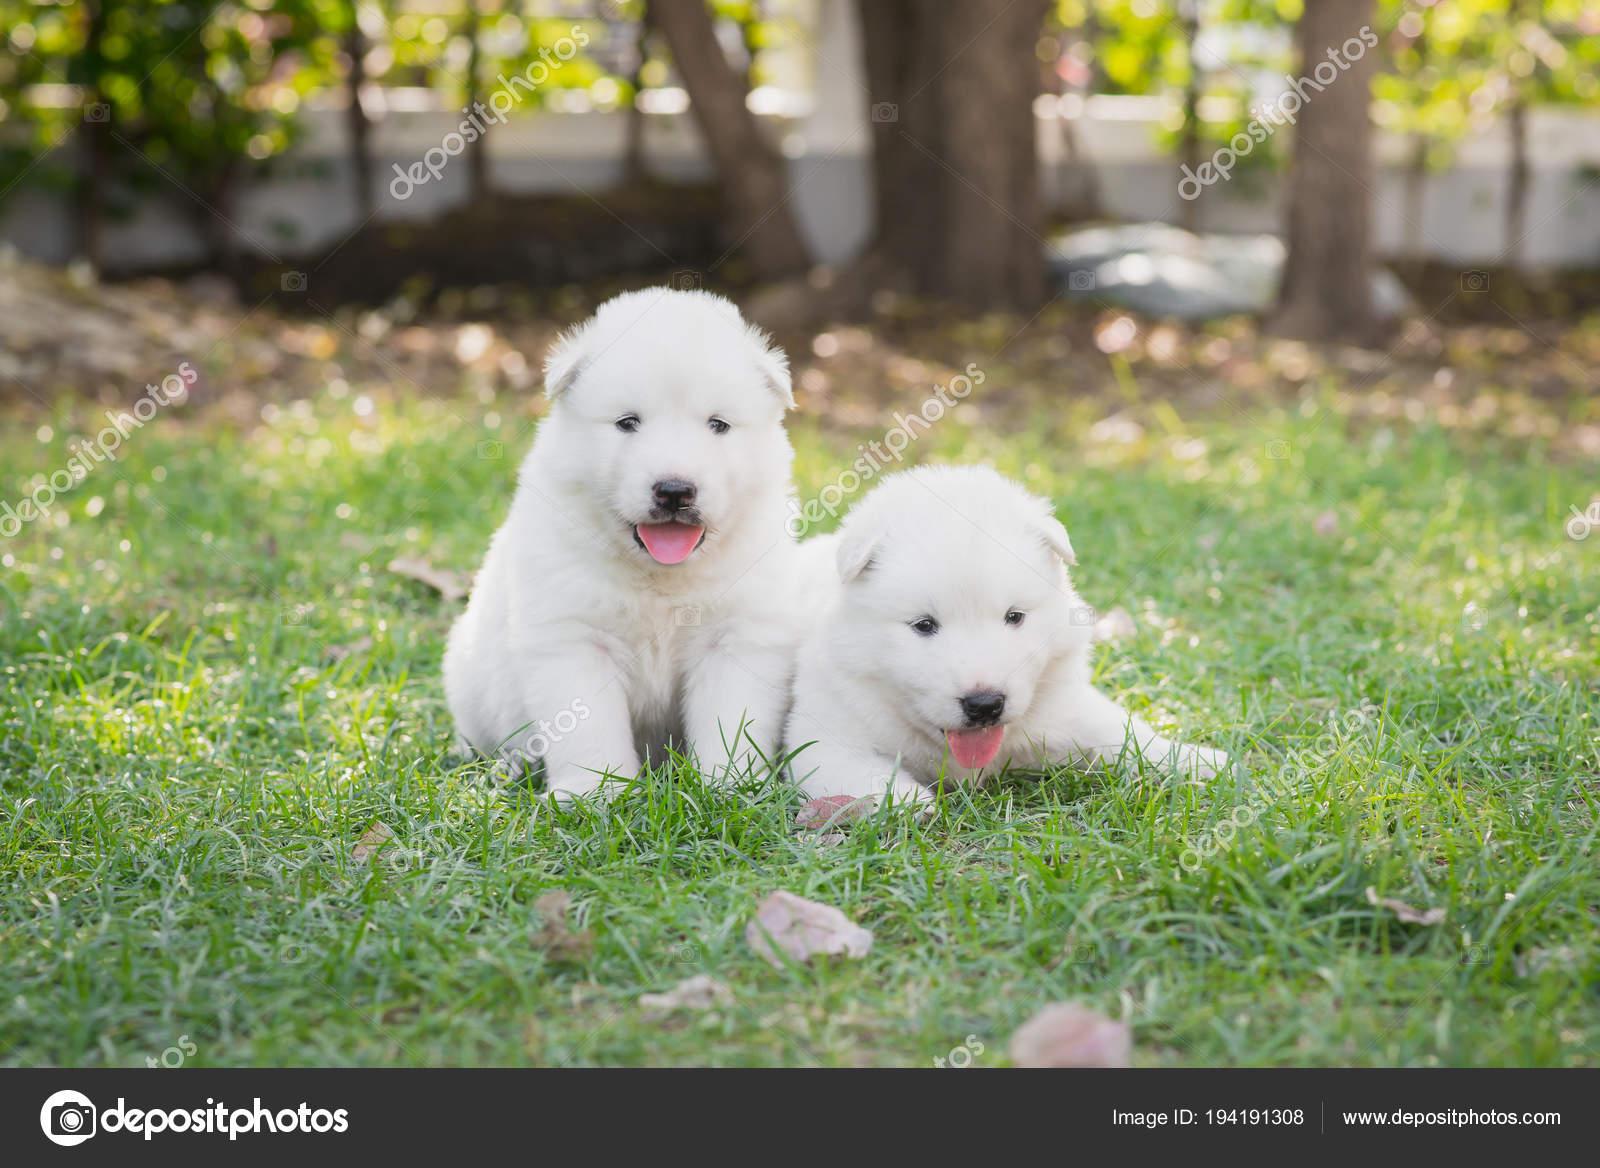 All White Baby Husky Two White Siberian Husky Puppies Sitting Grass Stock Photo C Lufimorgan 194191308